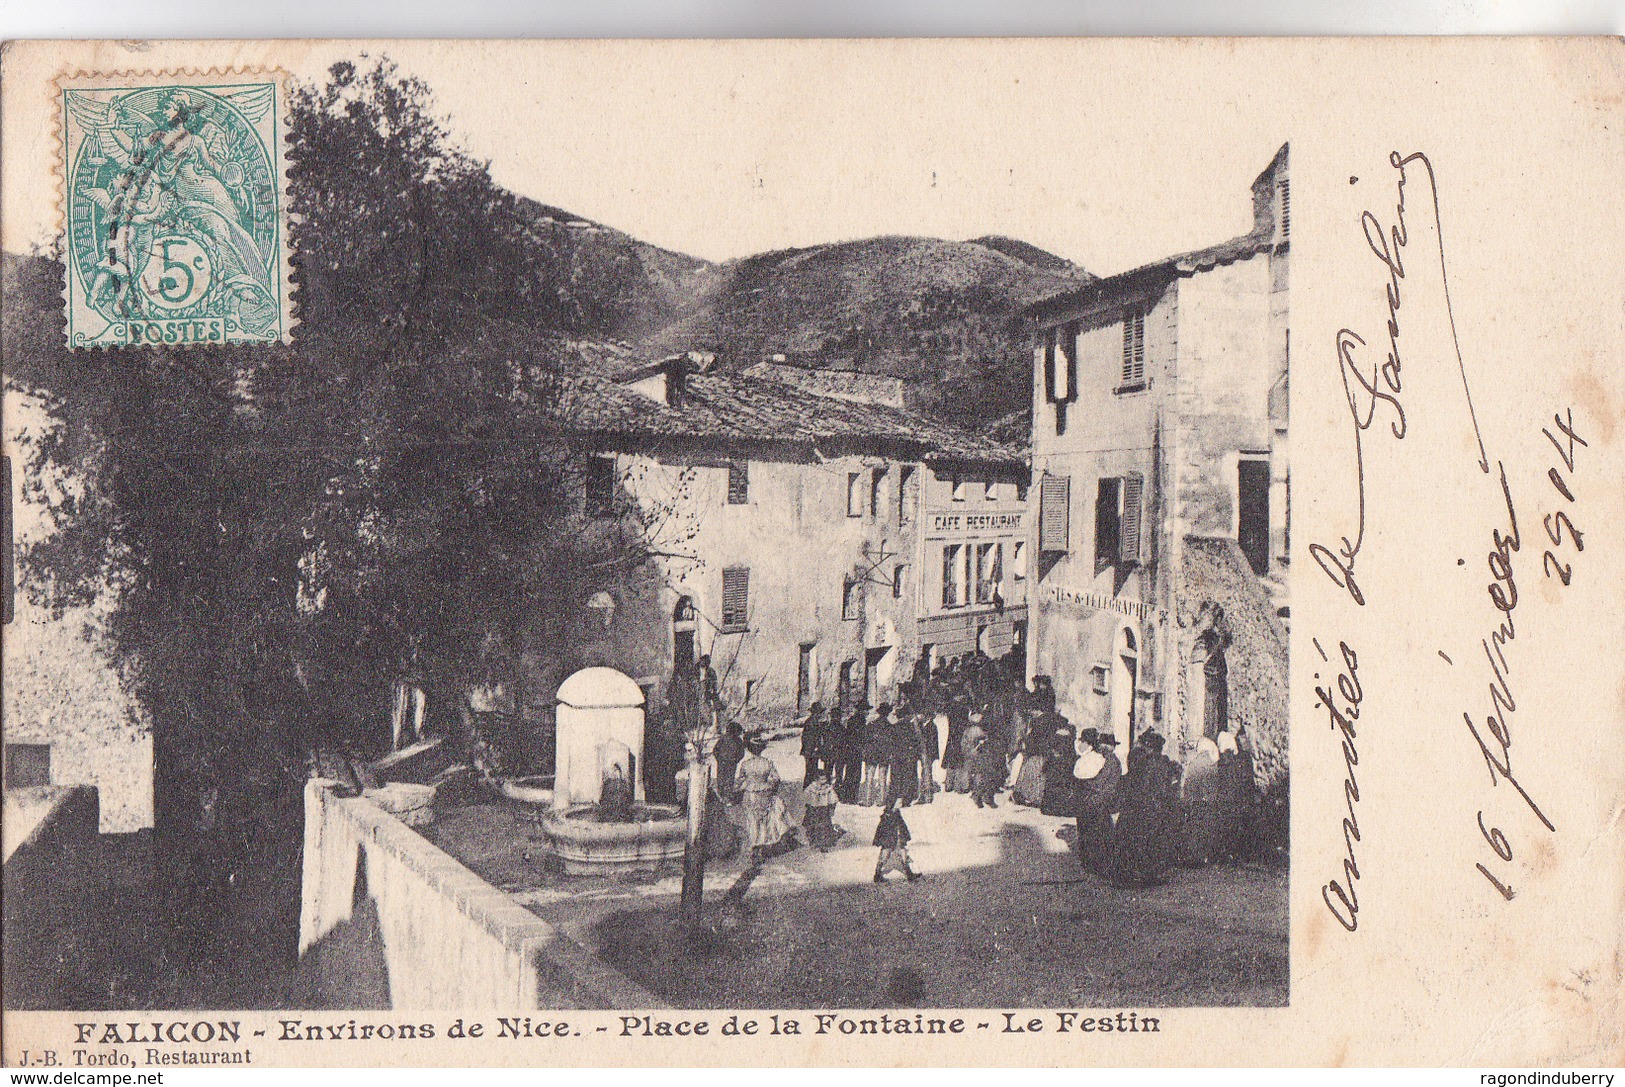 CPA - 06 - FALICON (Environs De NICE) - Place De La Fontaine - LE FESTIN - 1904 - Edit J.B.TORDO Restaurant - Altri Comuni